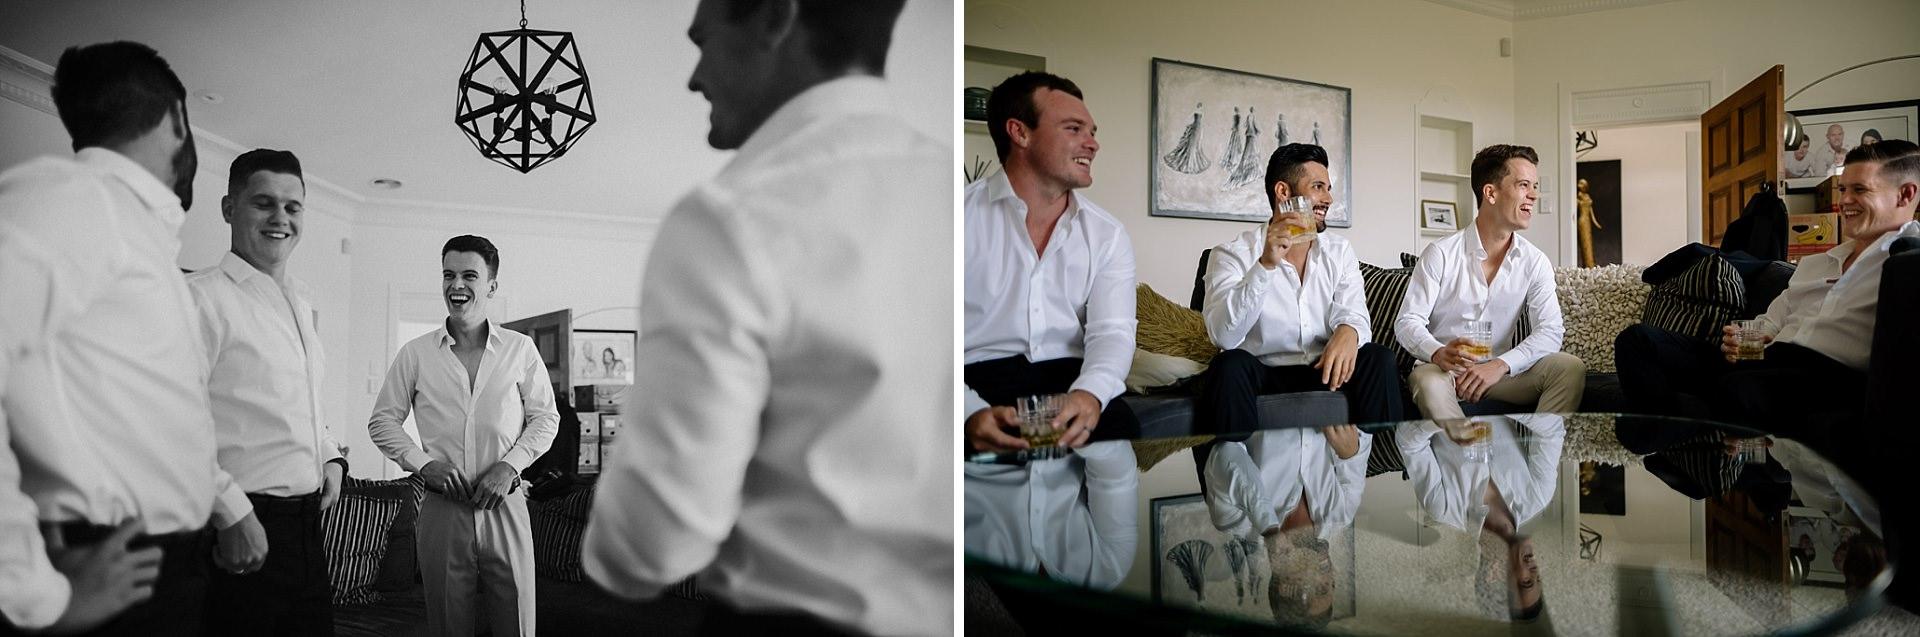 Groom and groomsman whisky photos